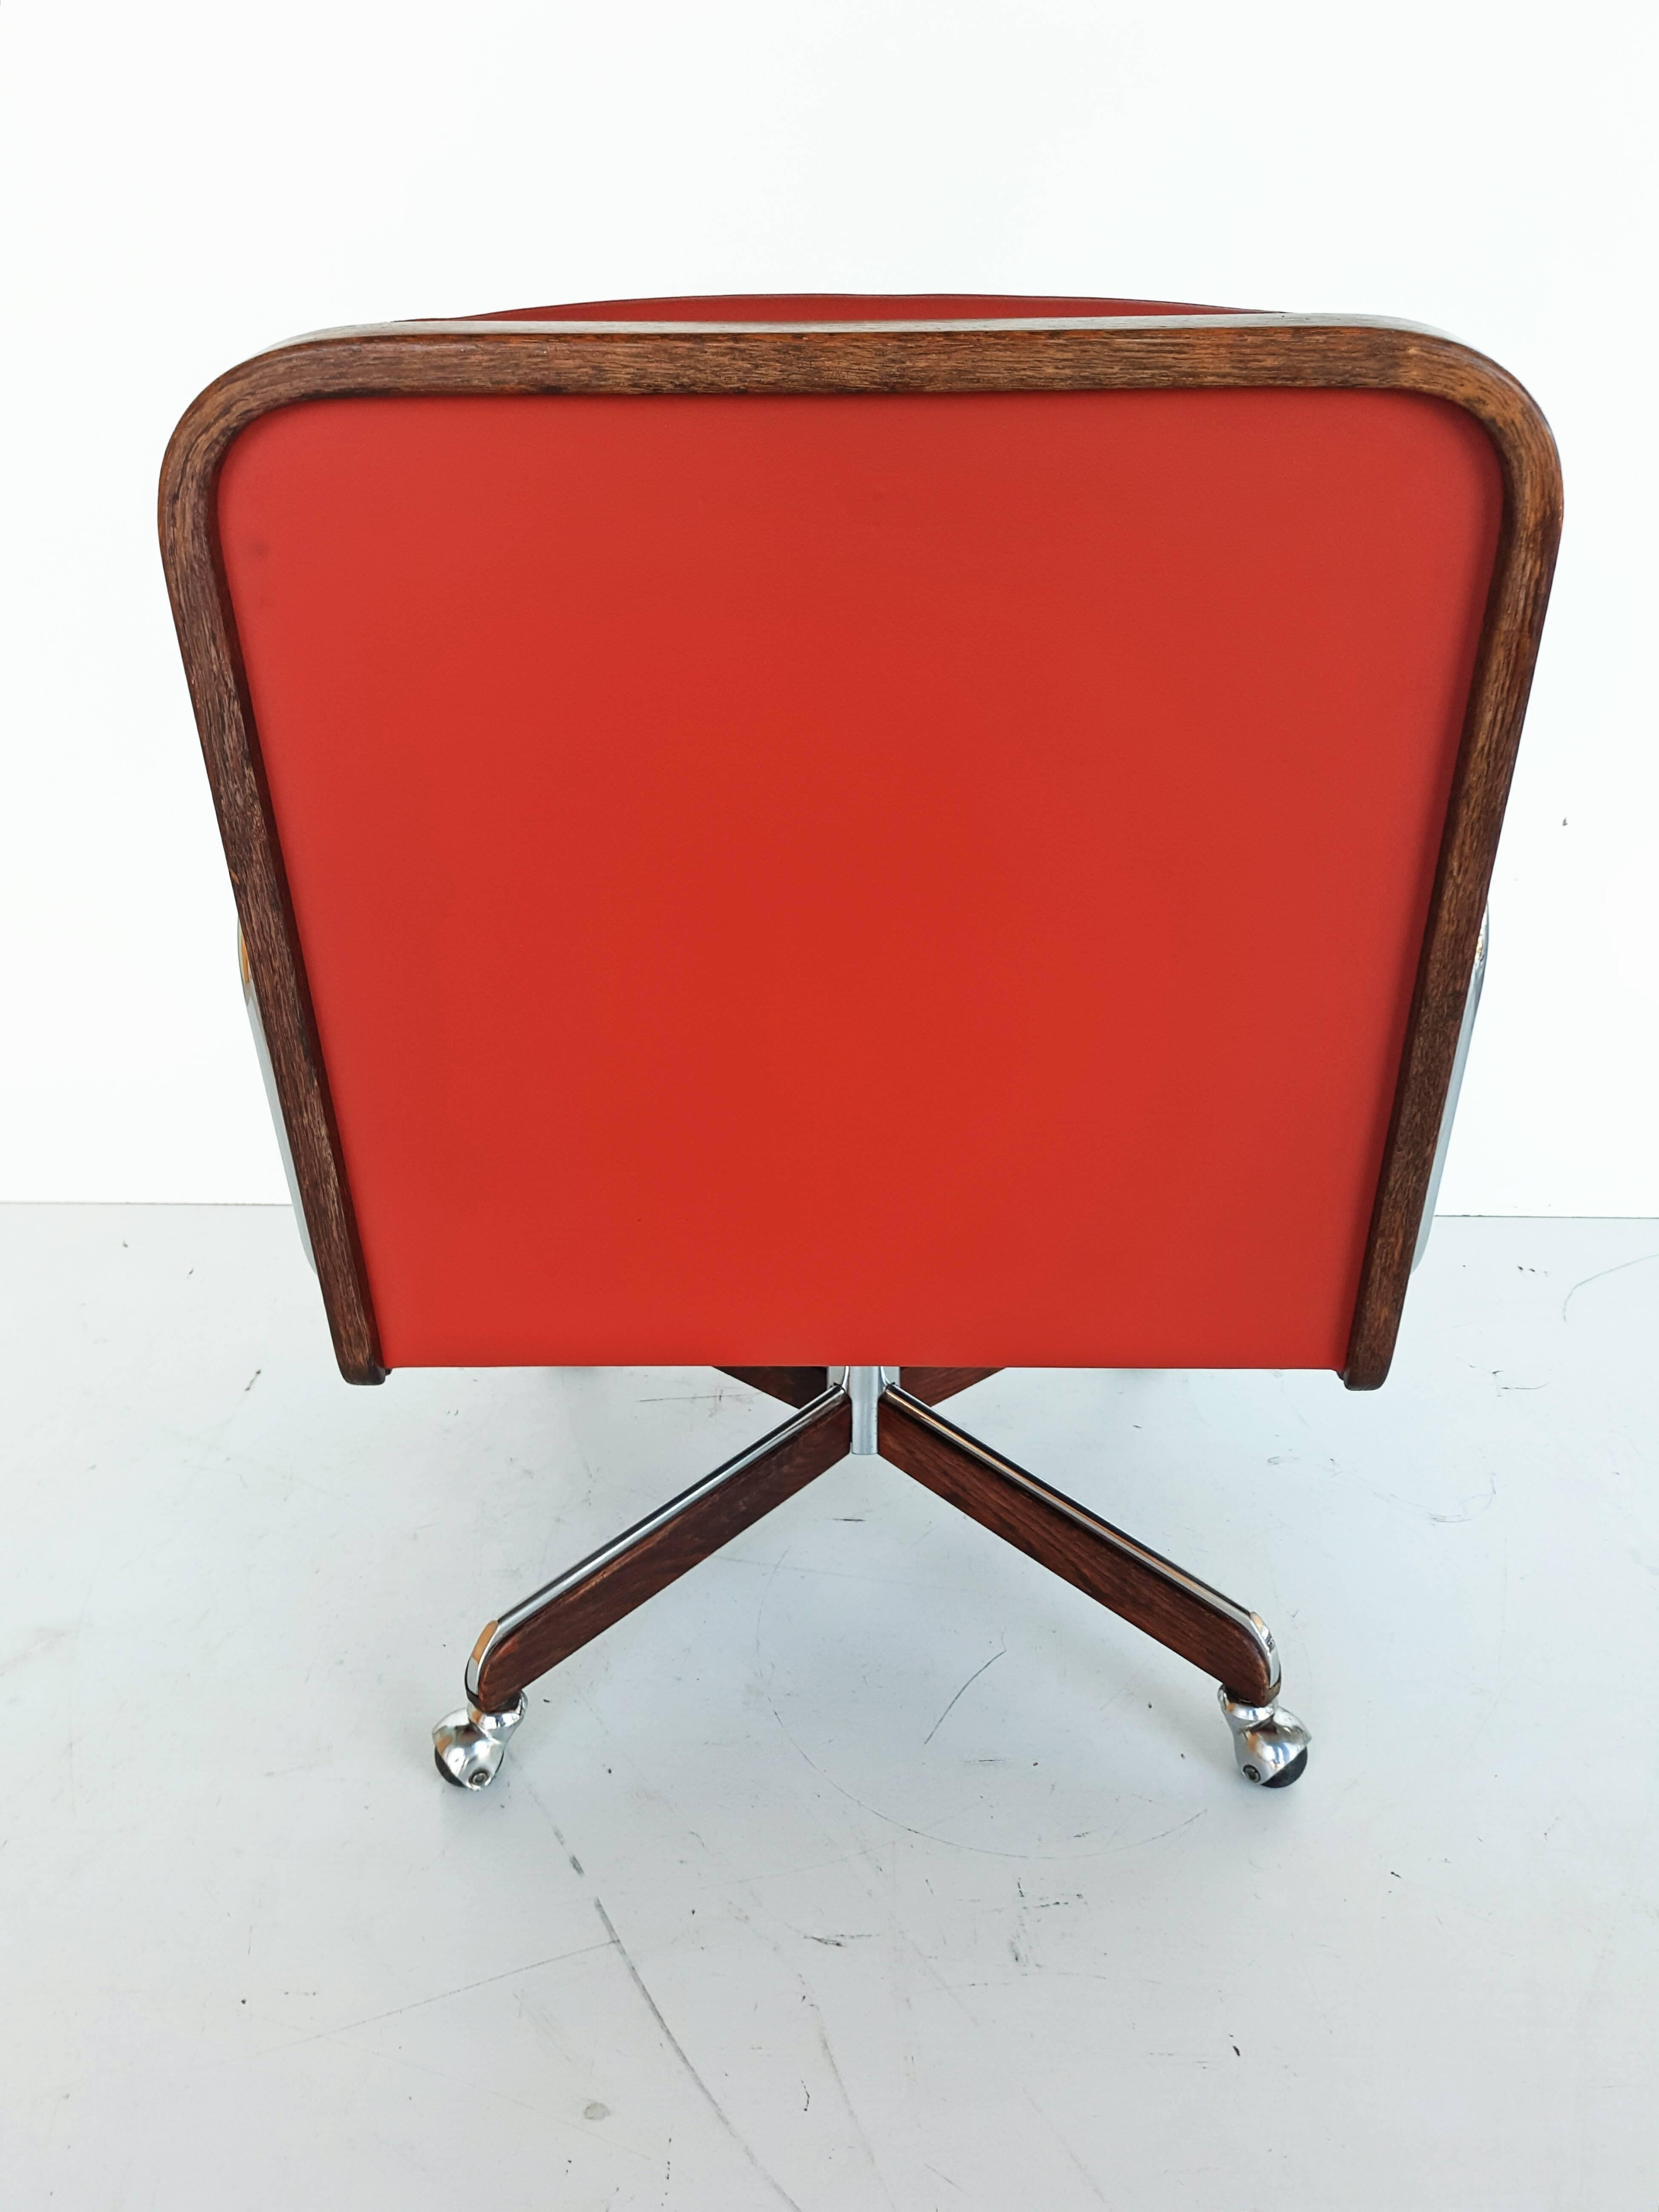 Rare Leather Swivel Armchair By Ag Barcelona, Circa 1970 For Sale 4